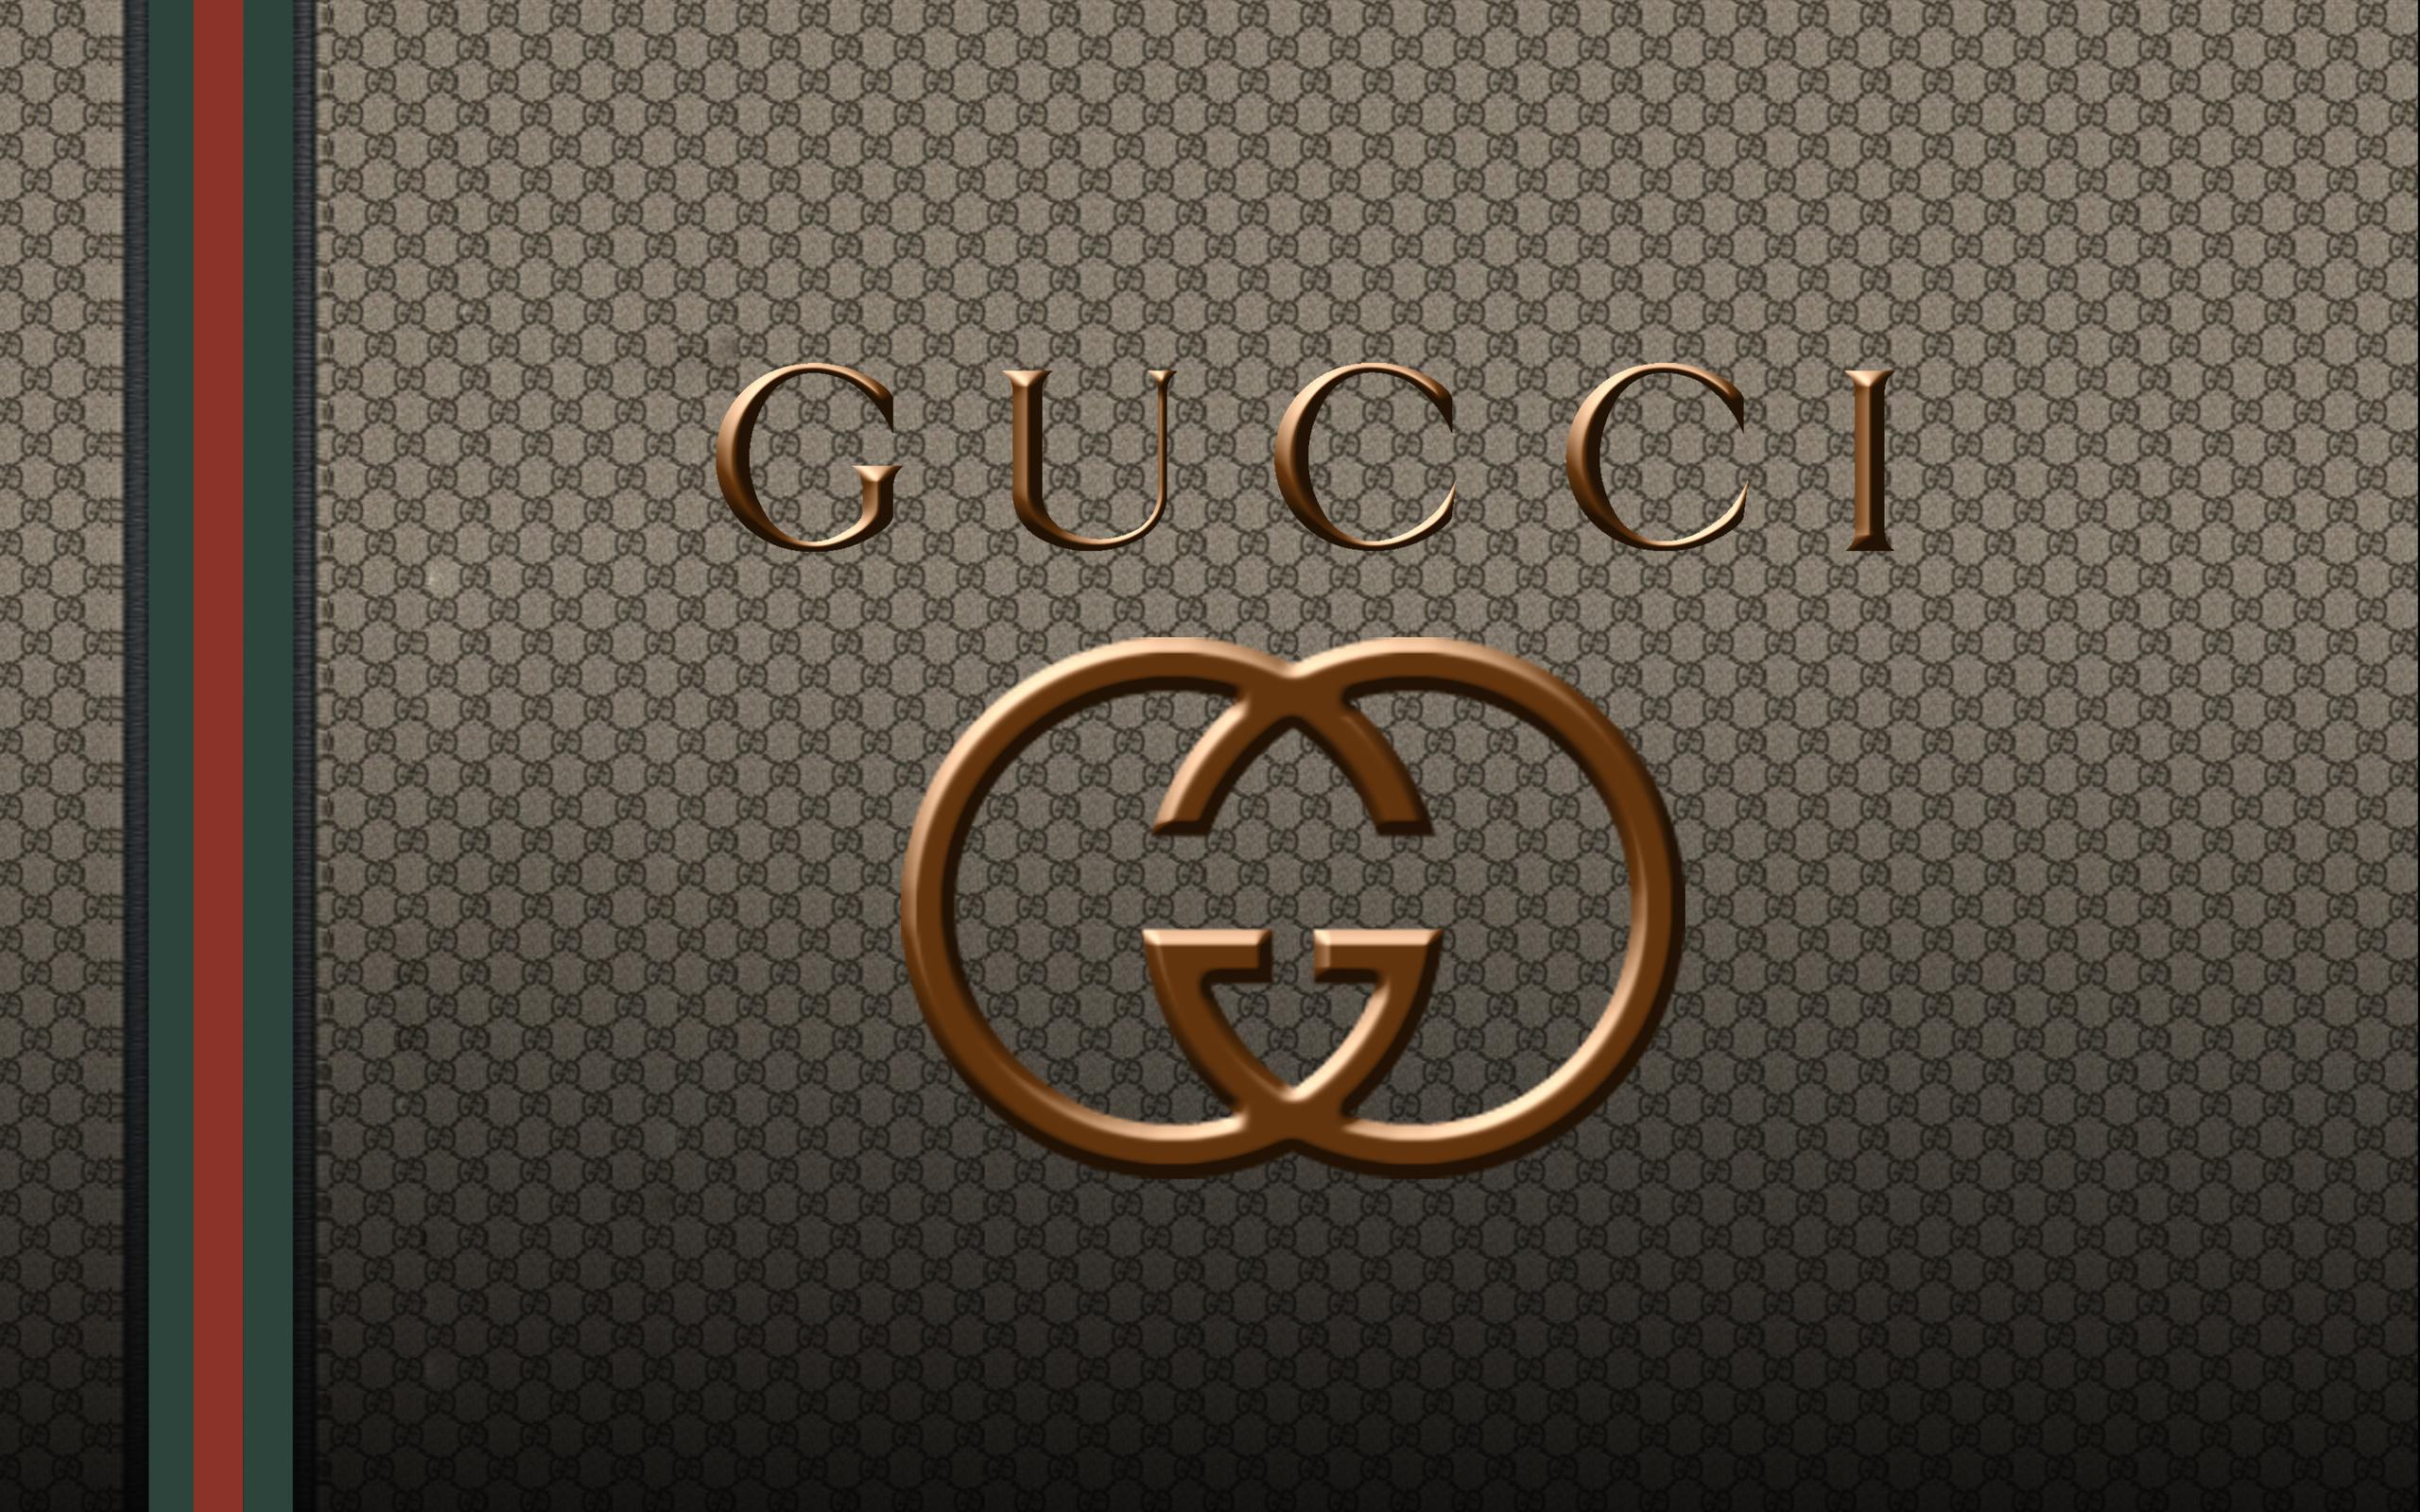 3d Painting Hd Wallpaper Gucci Logo Wallpapers Hd Pixelstalk Net